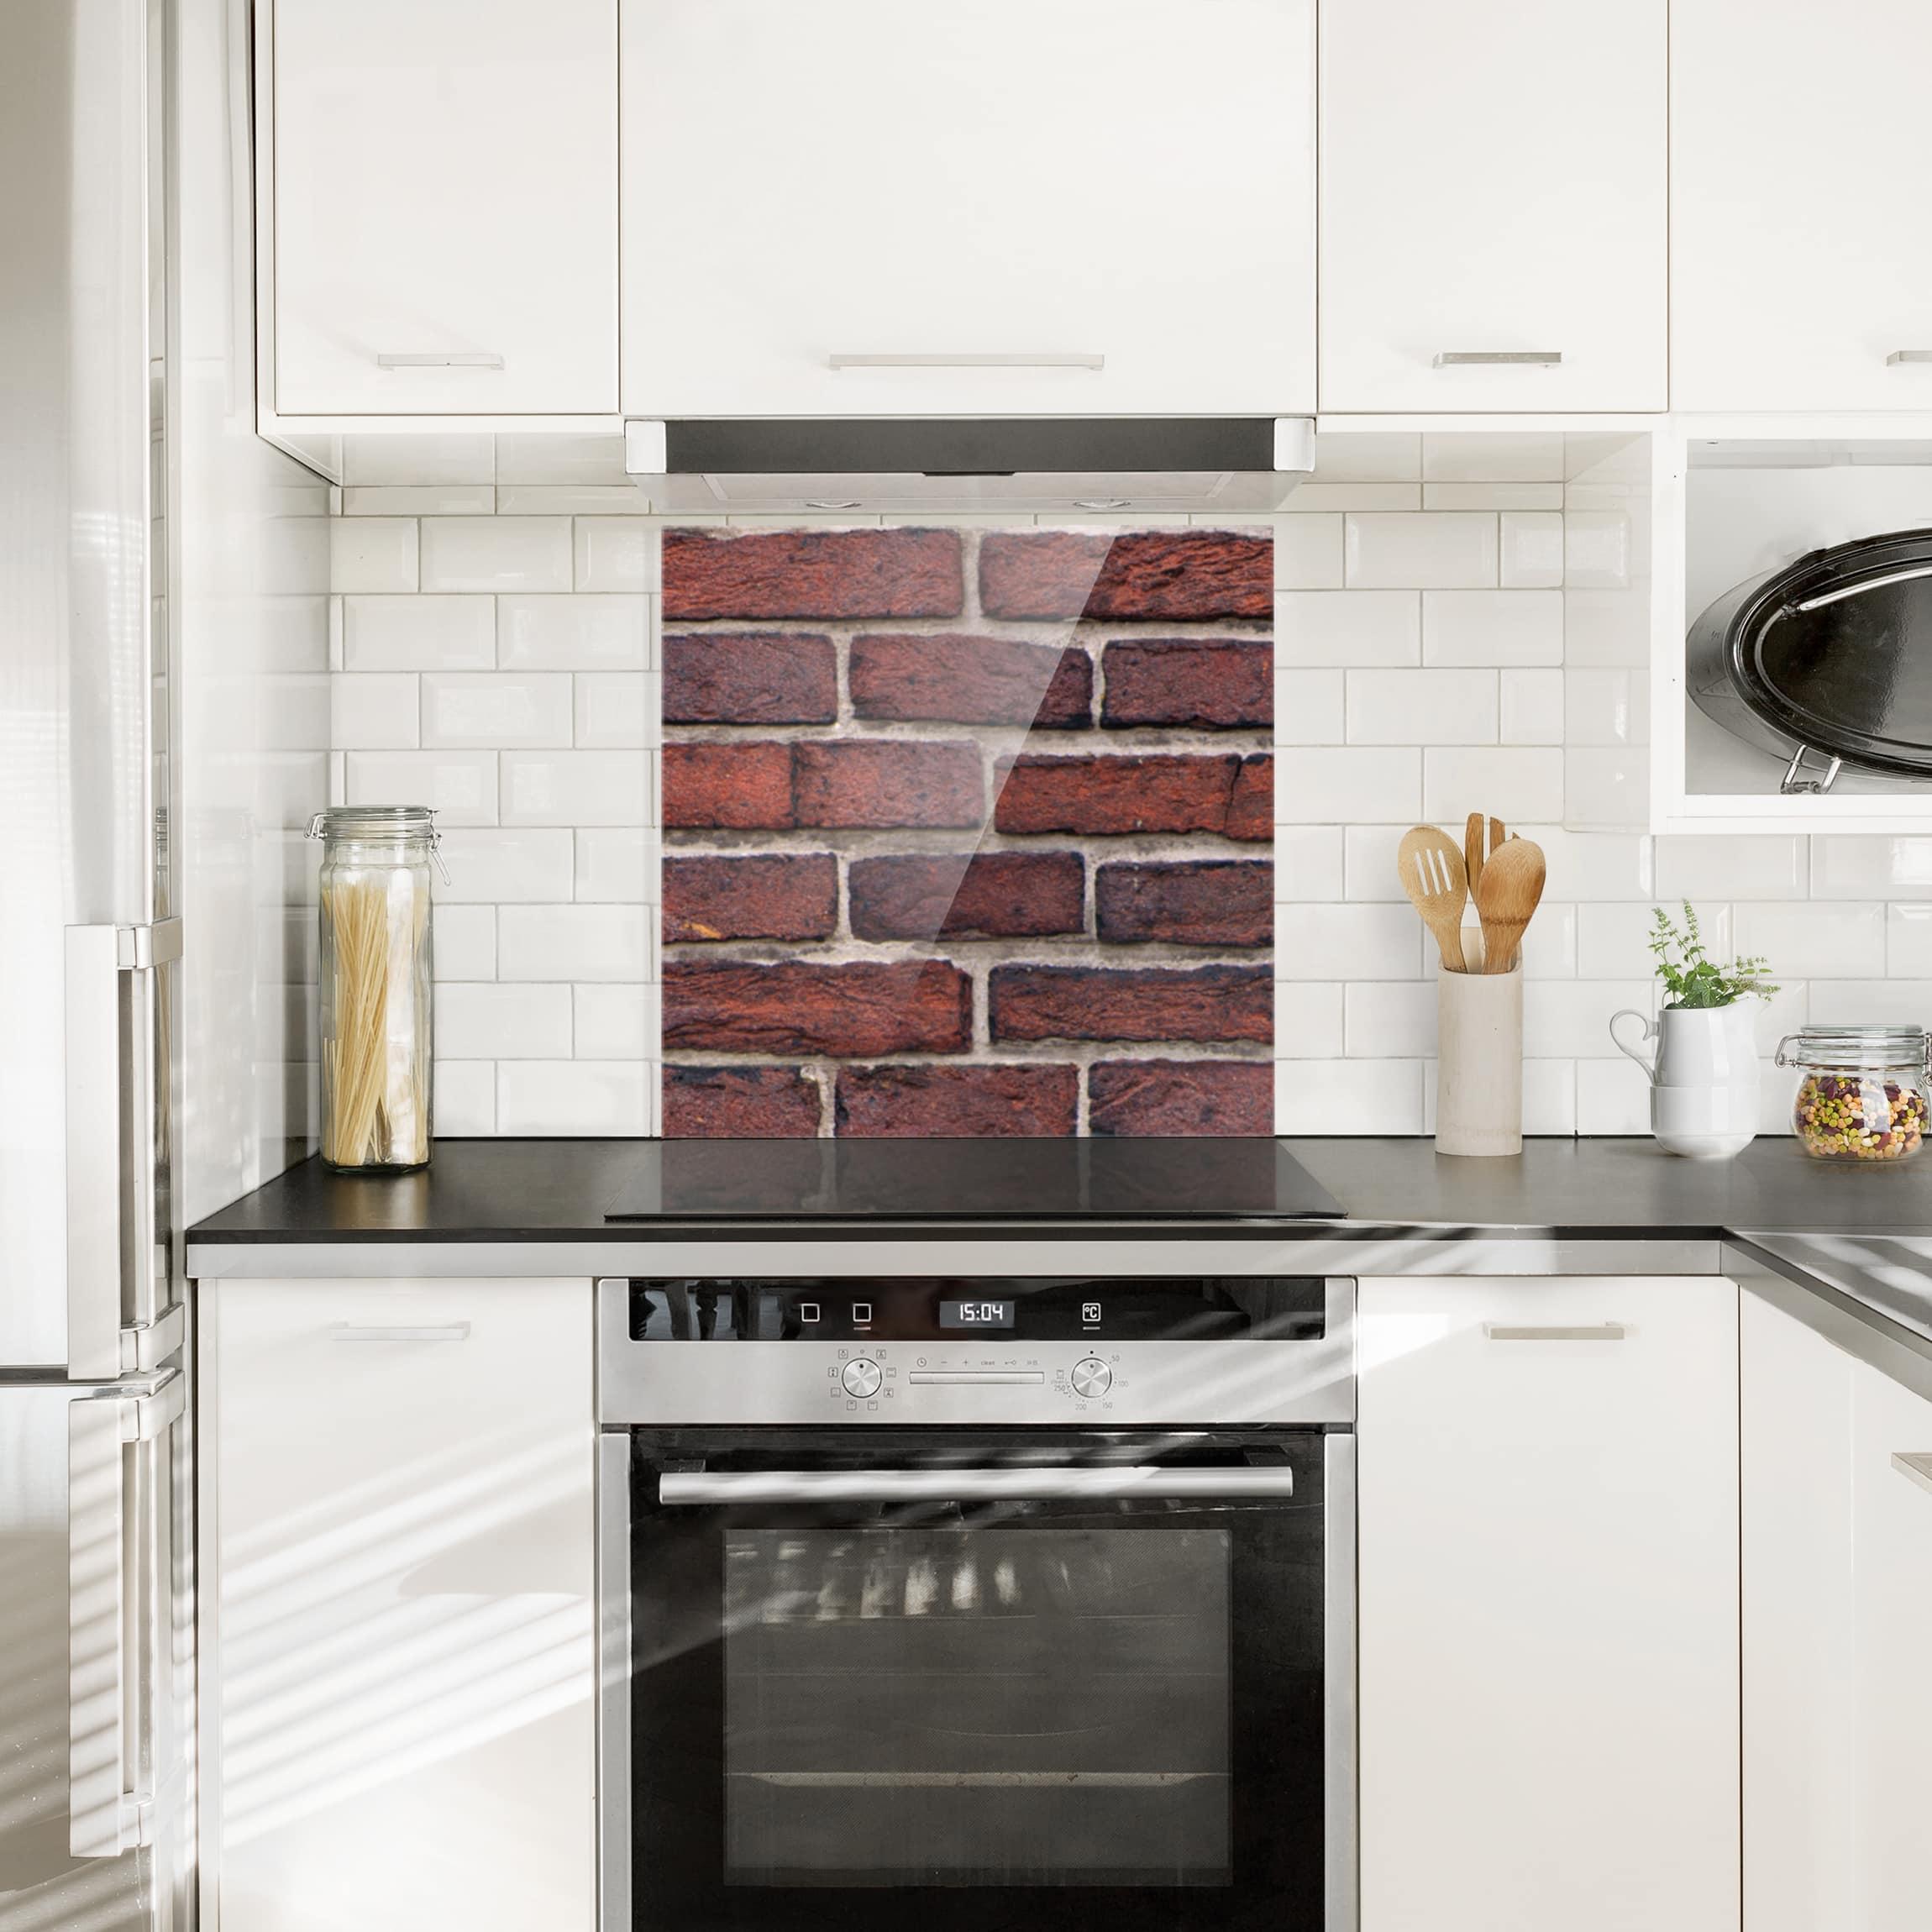 spritzschutz glas backsteinwand rot quadrat 1 1. Black Bedroom Furniture Sets. Home Design Ideas